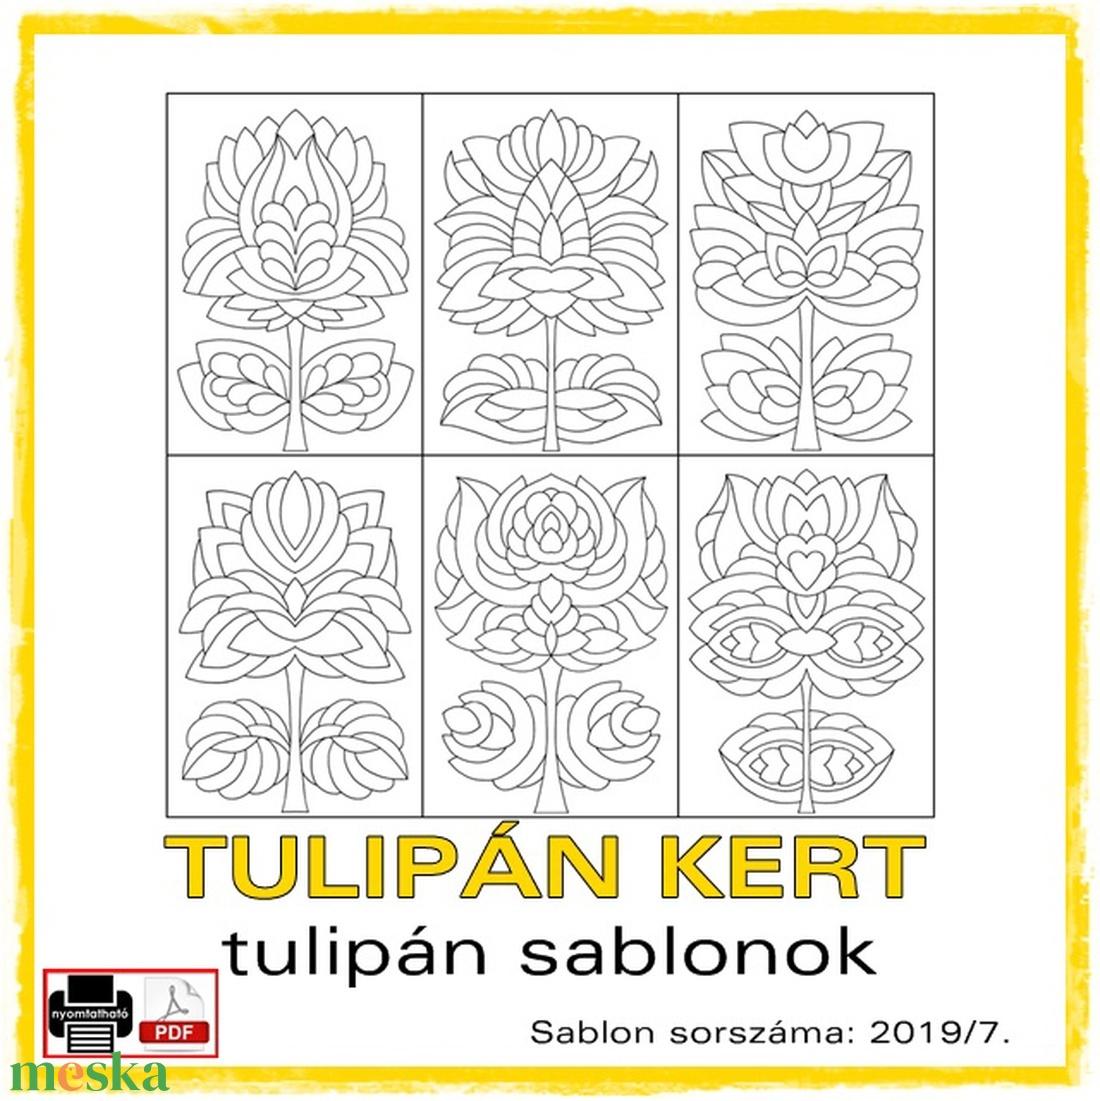 TulipánKert 2019/7 (kedo) - Meska.hu